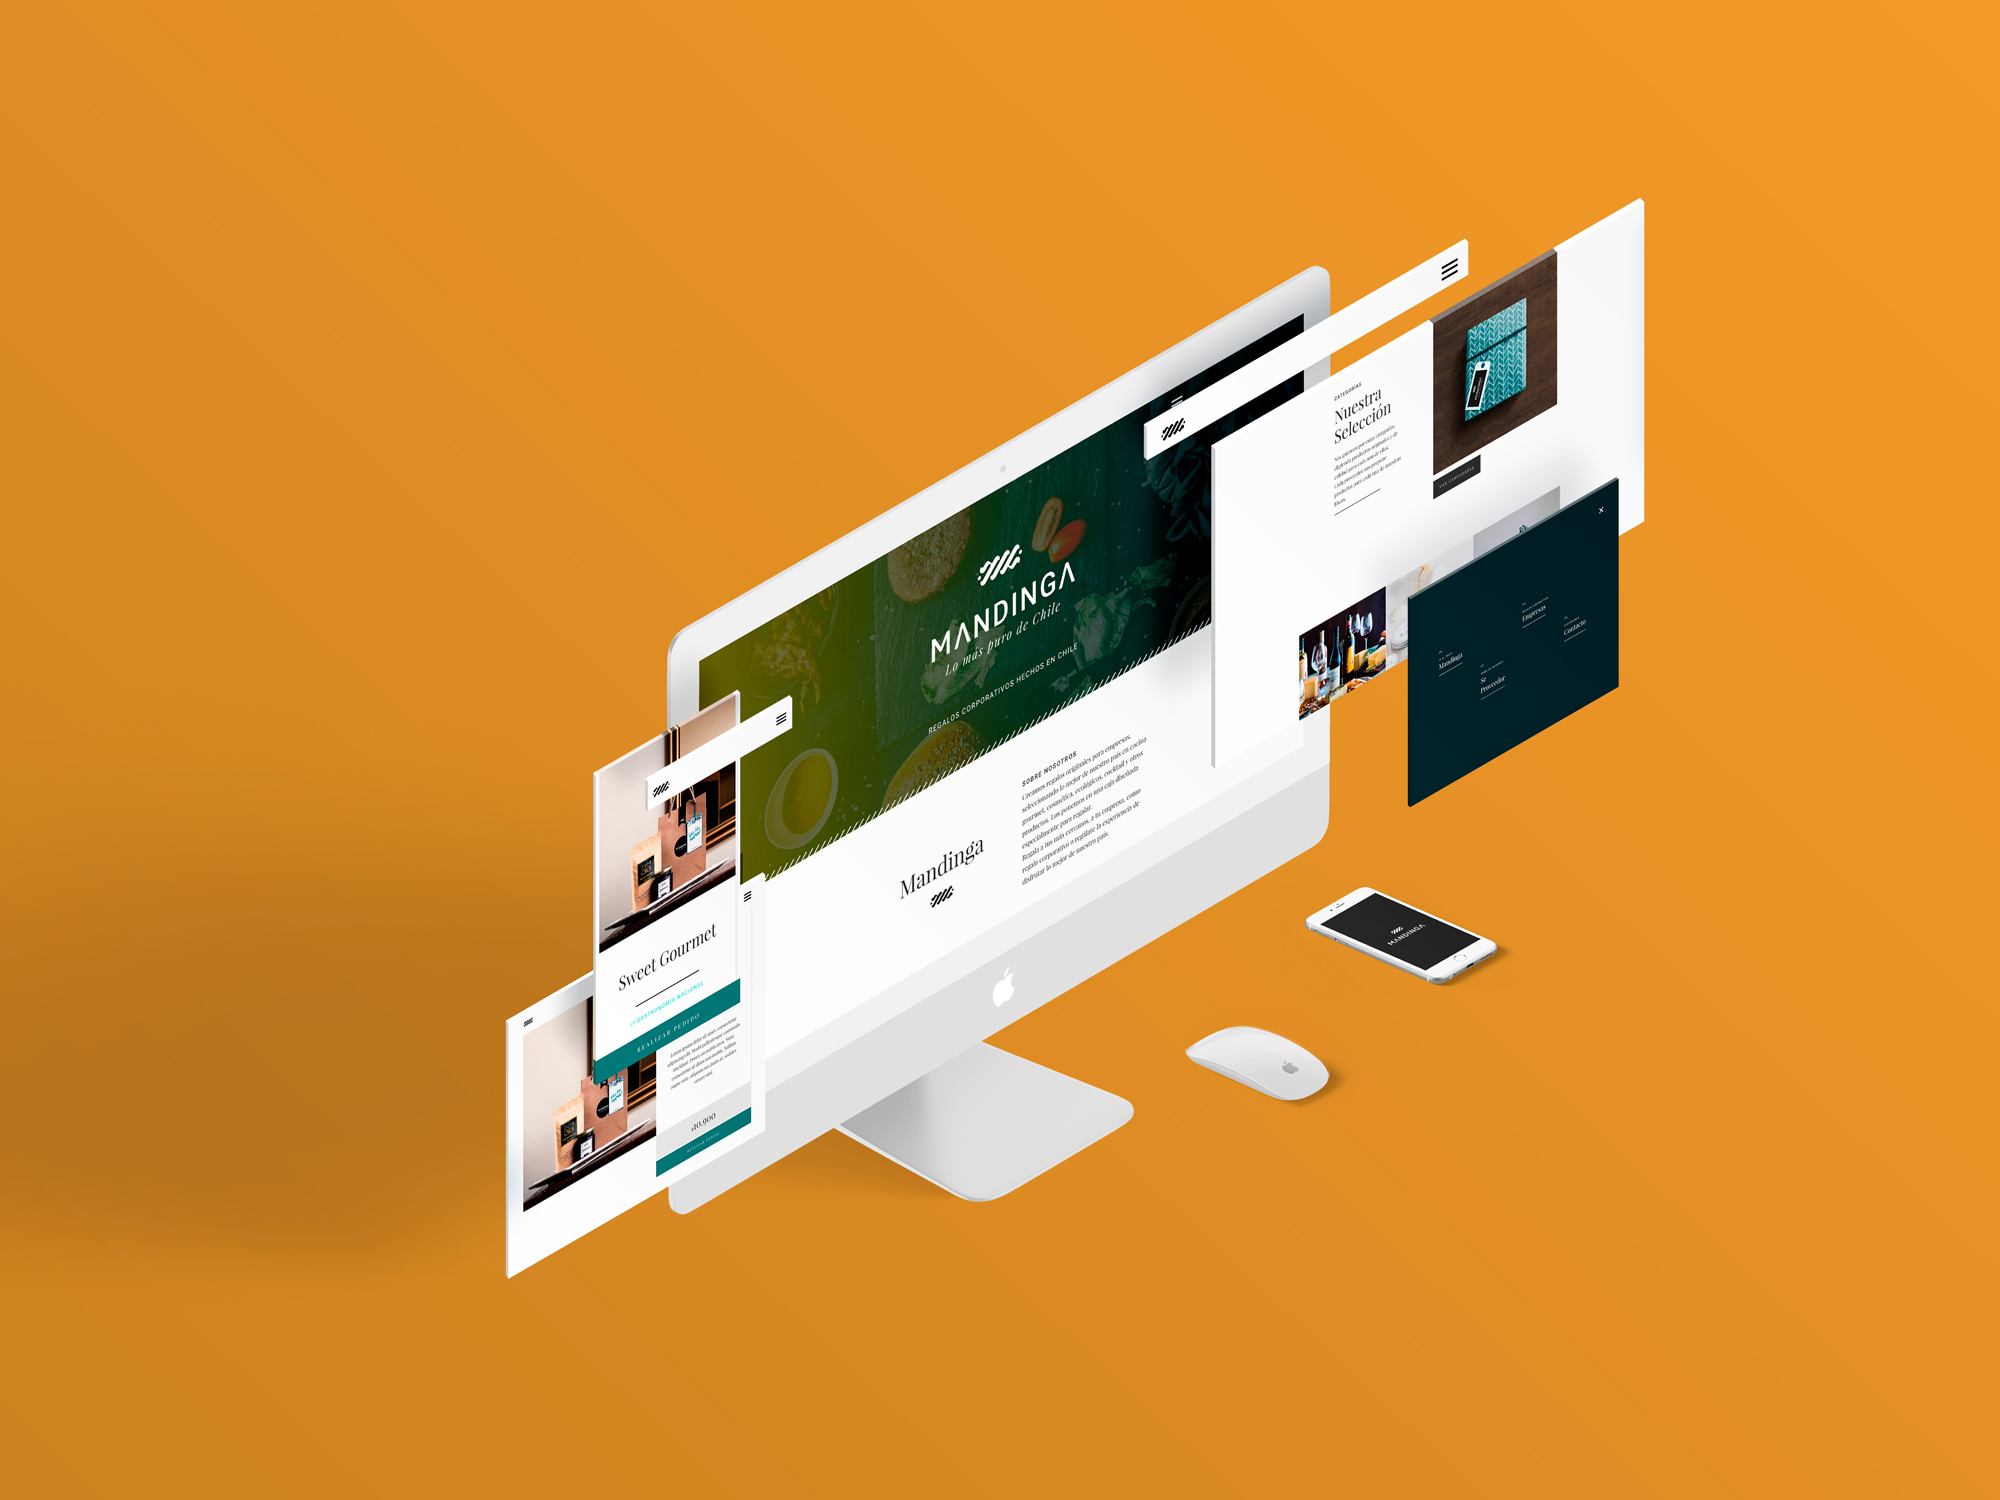 Sitio Web Autoadministrable para Mandinga, Holymonkey, Agencia Creativa Digital. Sitios Web, Audiovisual y Diseño gráfico para empresas, Providencia, Santiago Chile.